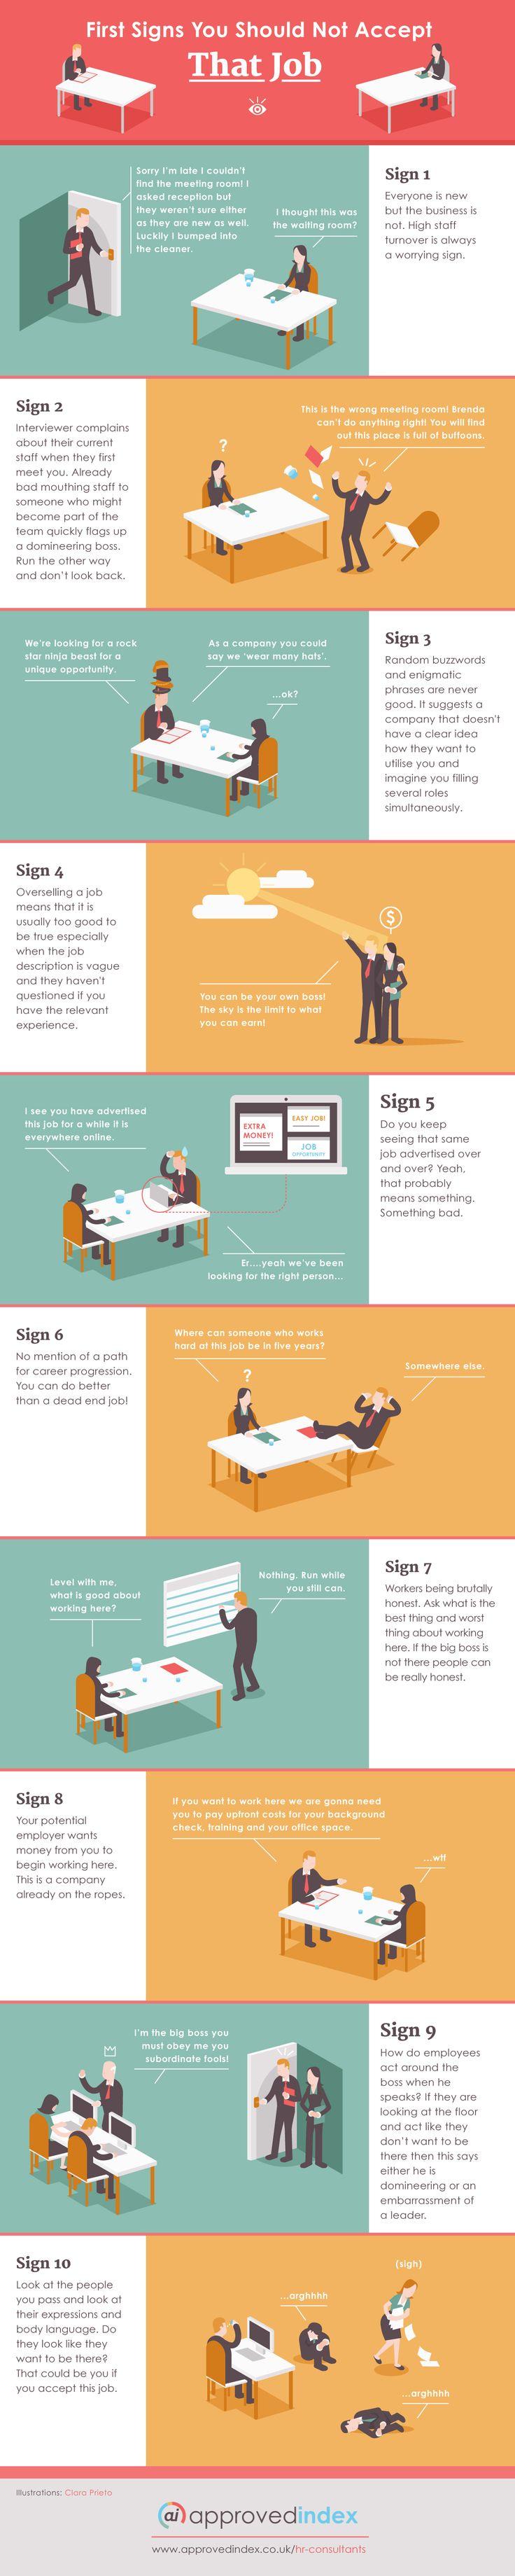 signs_you_should_not_accept_job